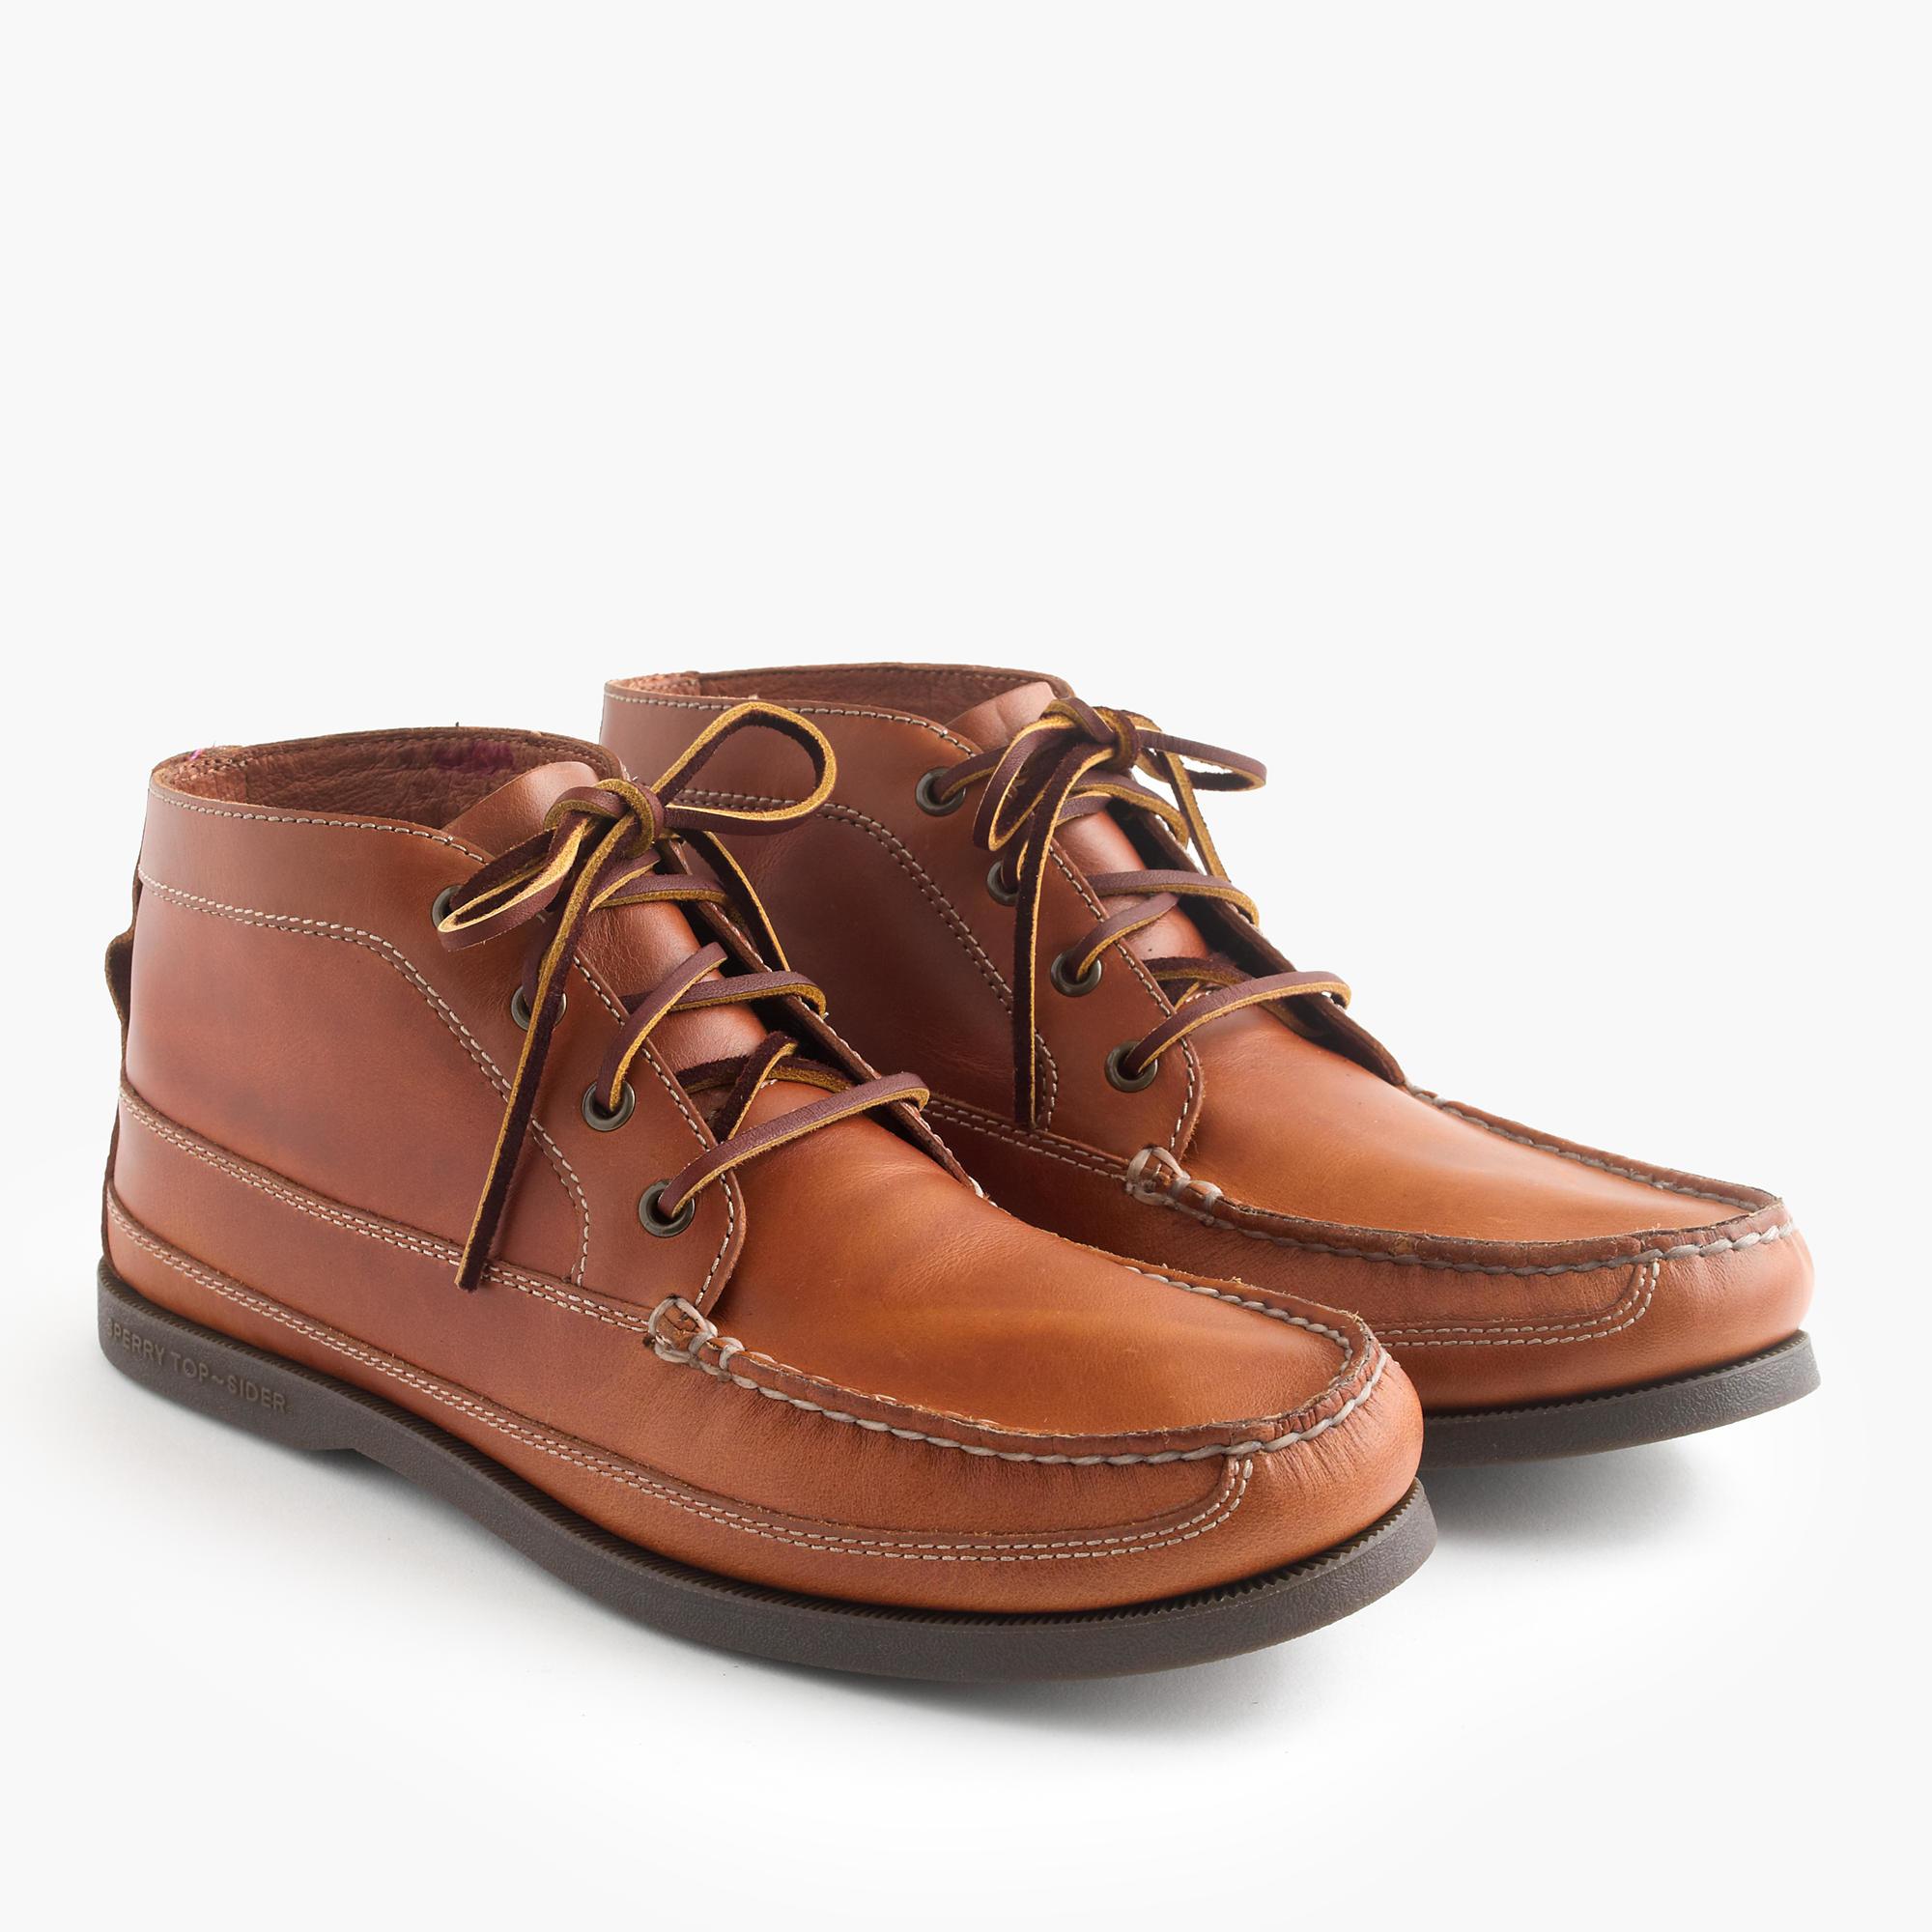 Creative Sperry Top-Sider A/O Lug Chukka Waterproof Leather Boots | Wooki